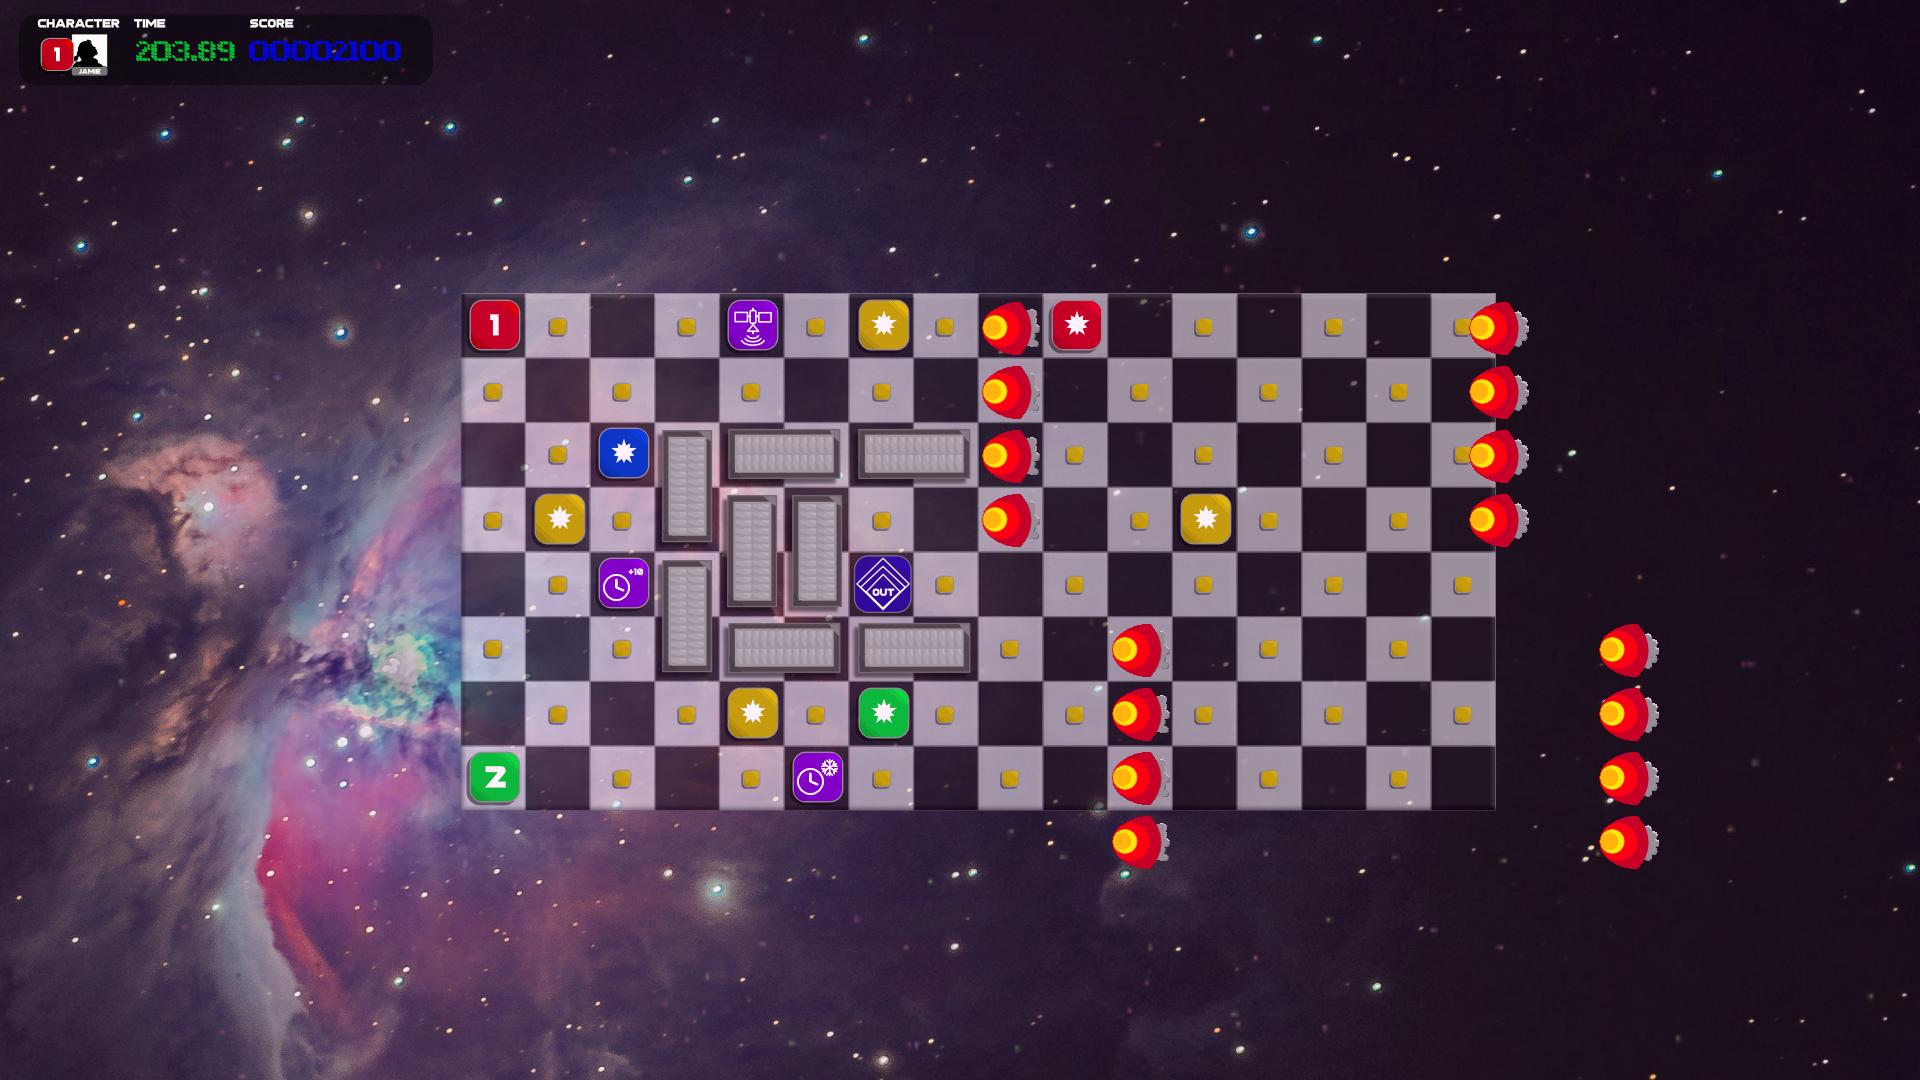 Level 3 Hyper Space